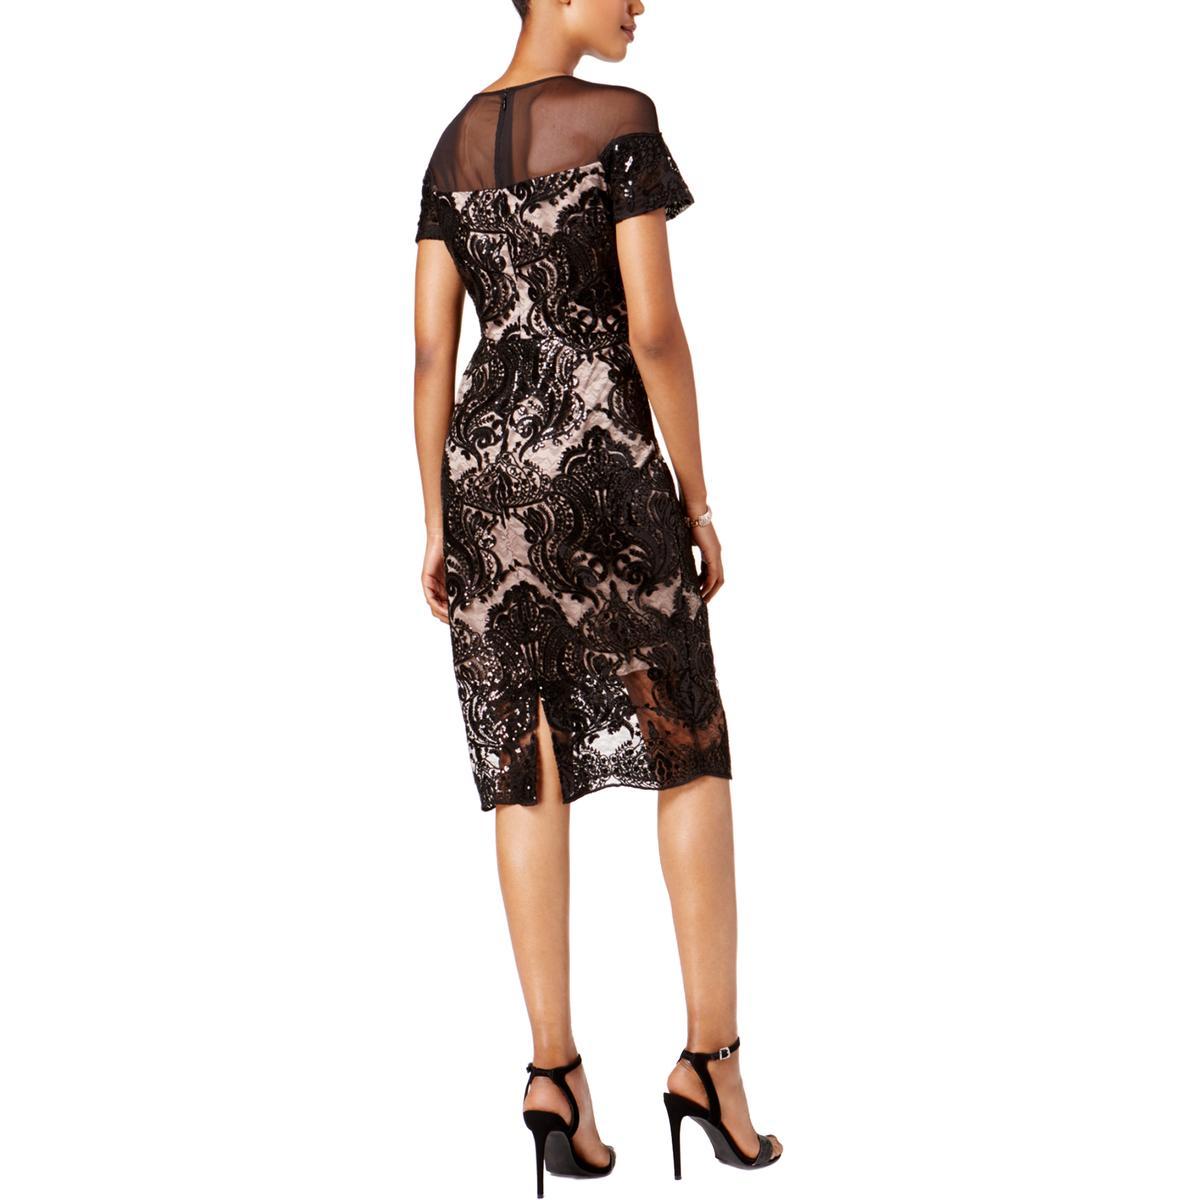 6a1f1fb2146 Jax Black Label Womens Sequined Cap Sleeves Sheath Cocktail Dress ...